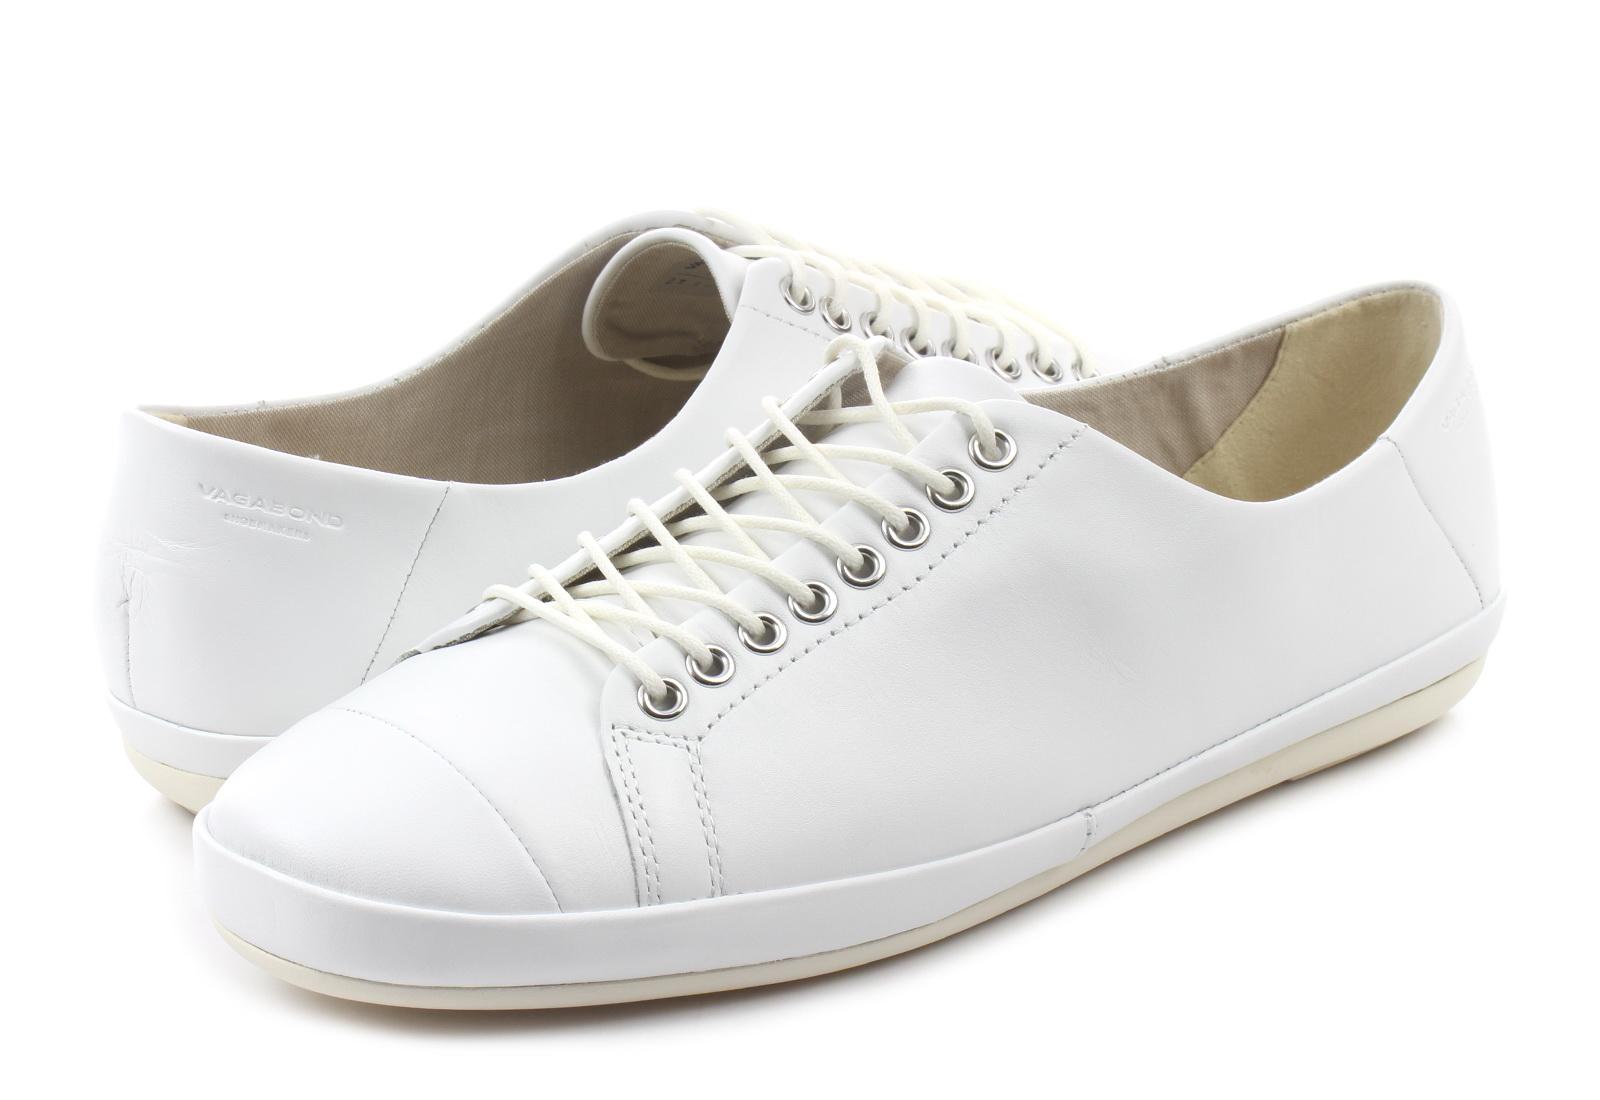 Białe skórzane buty Rose Premium